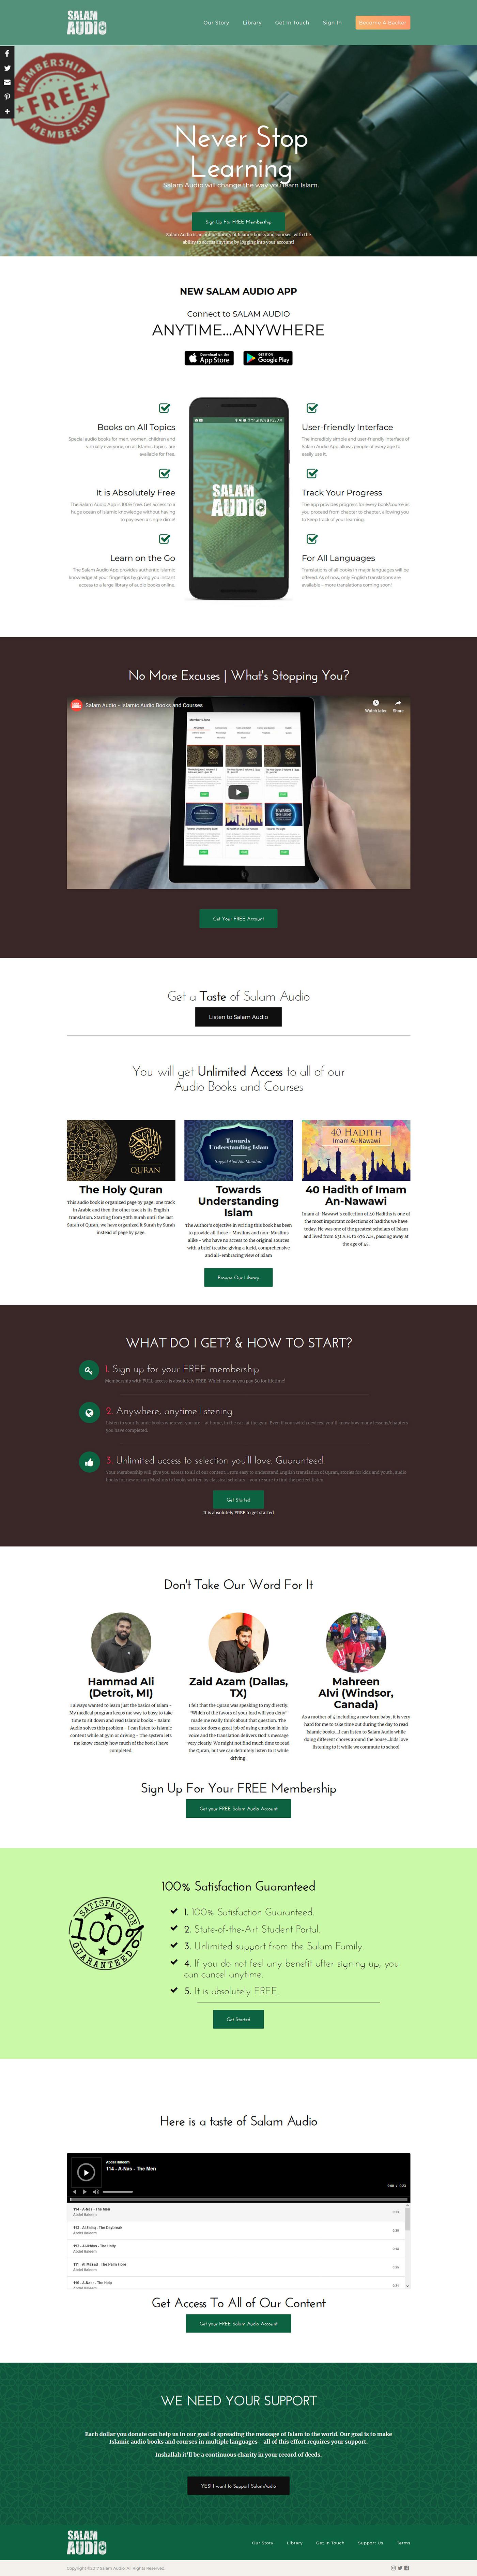 audio app Islamic App  web development  website template learning template Blog App Landing Page